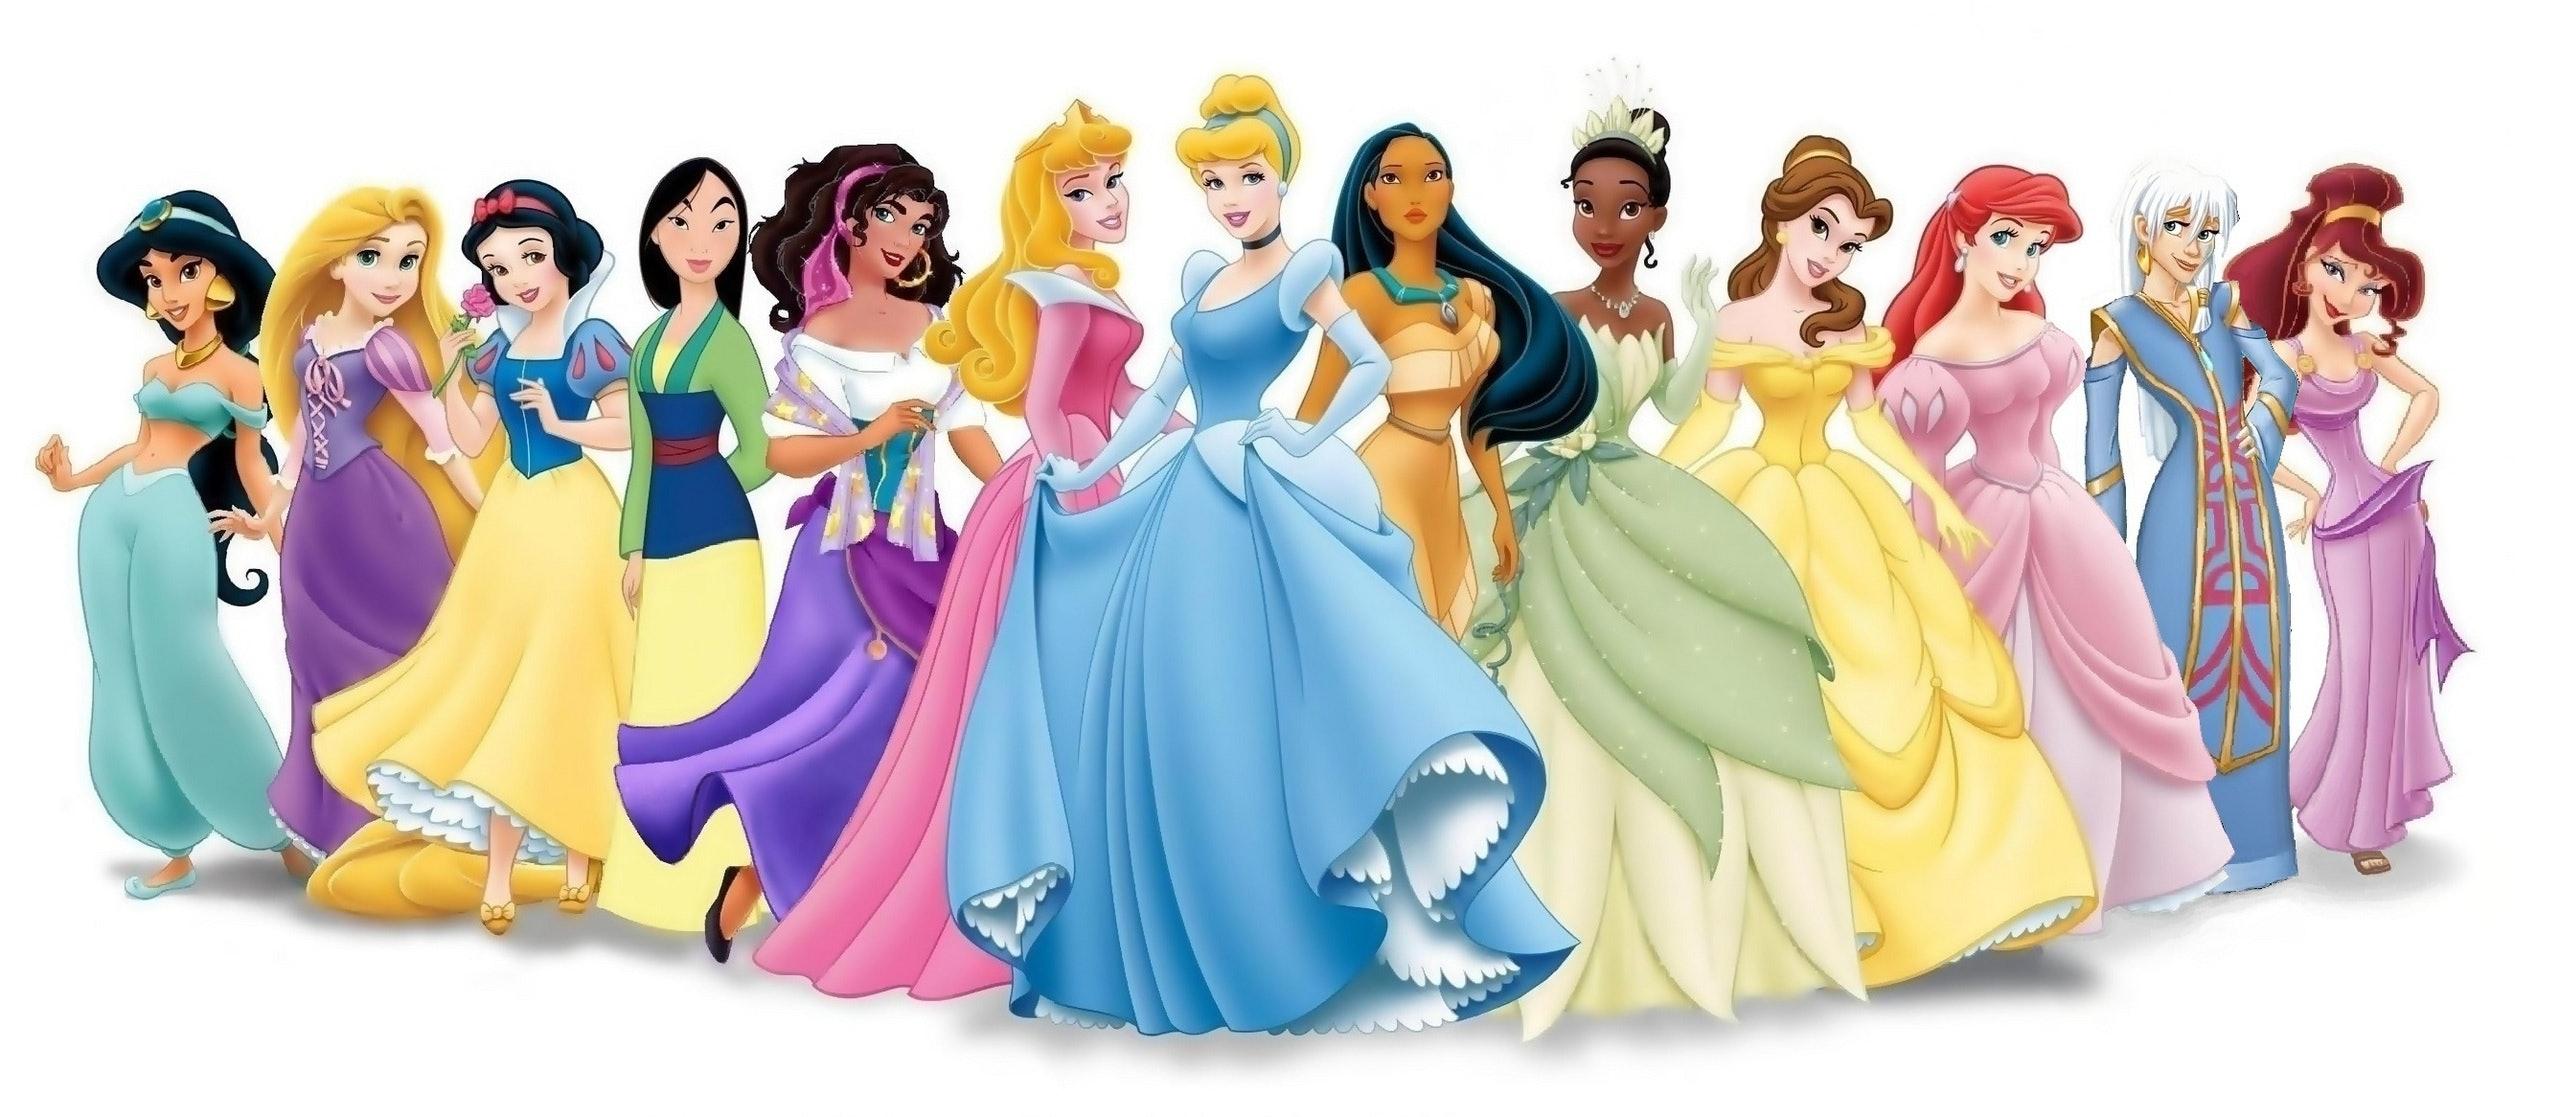 the most stylish disney princesses a definitive ranking